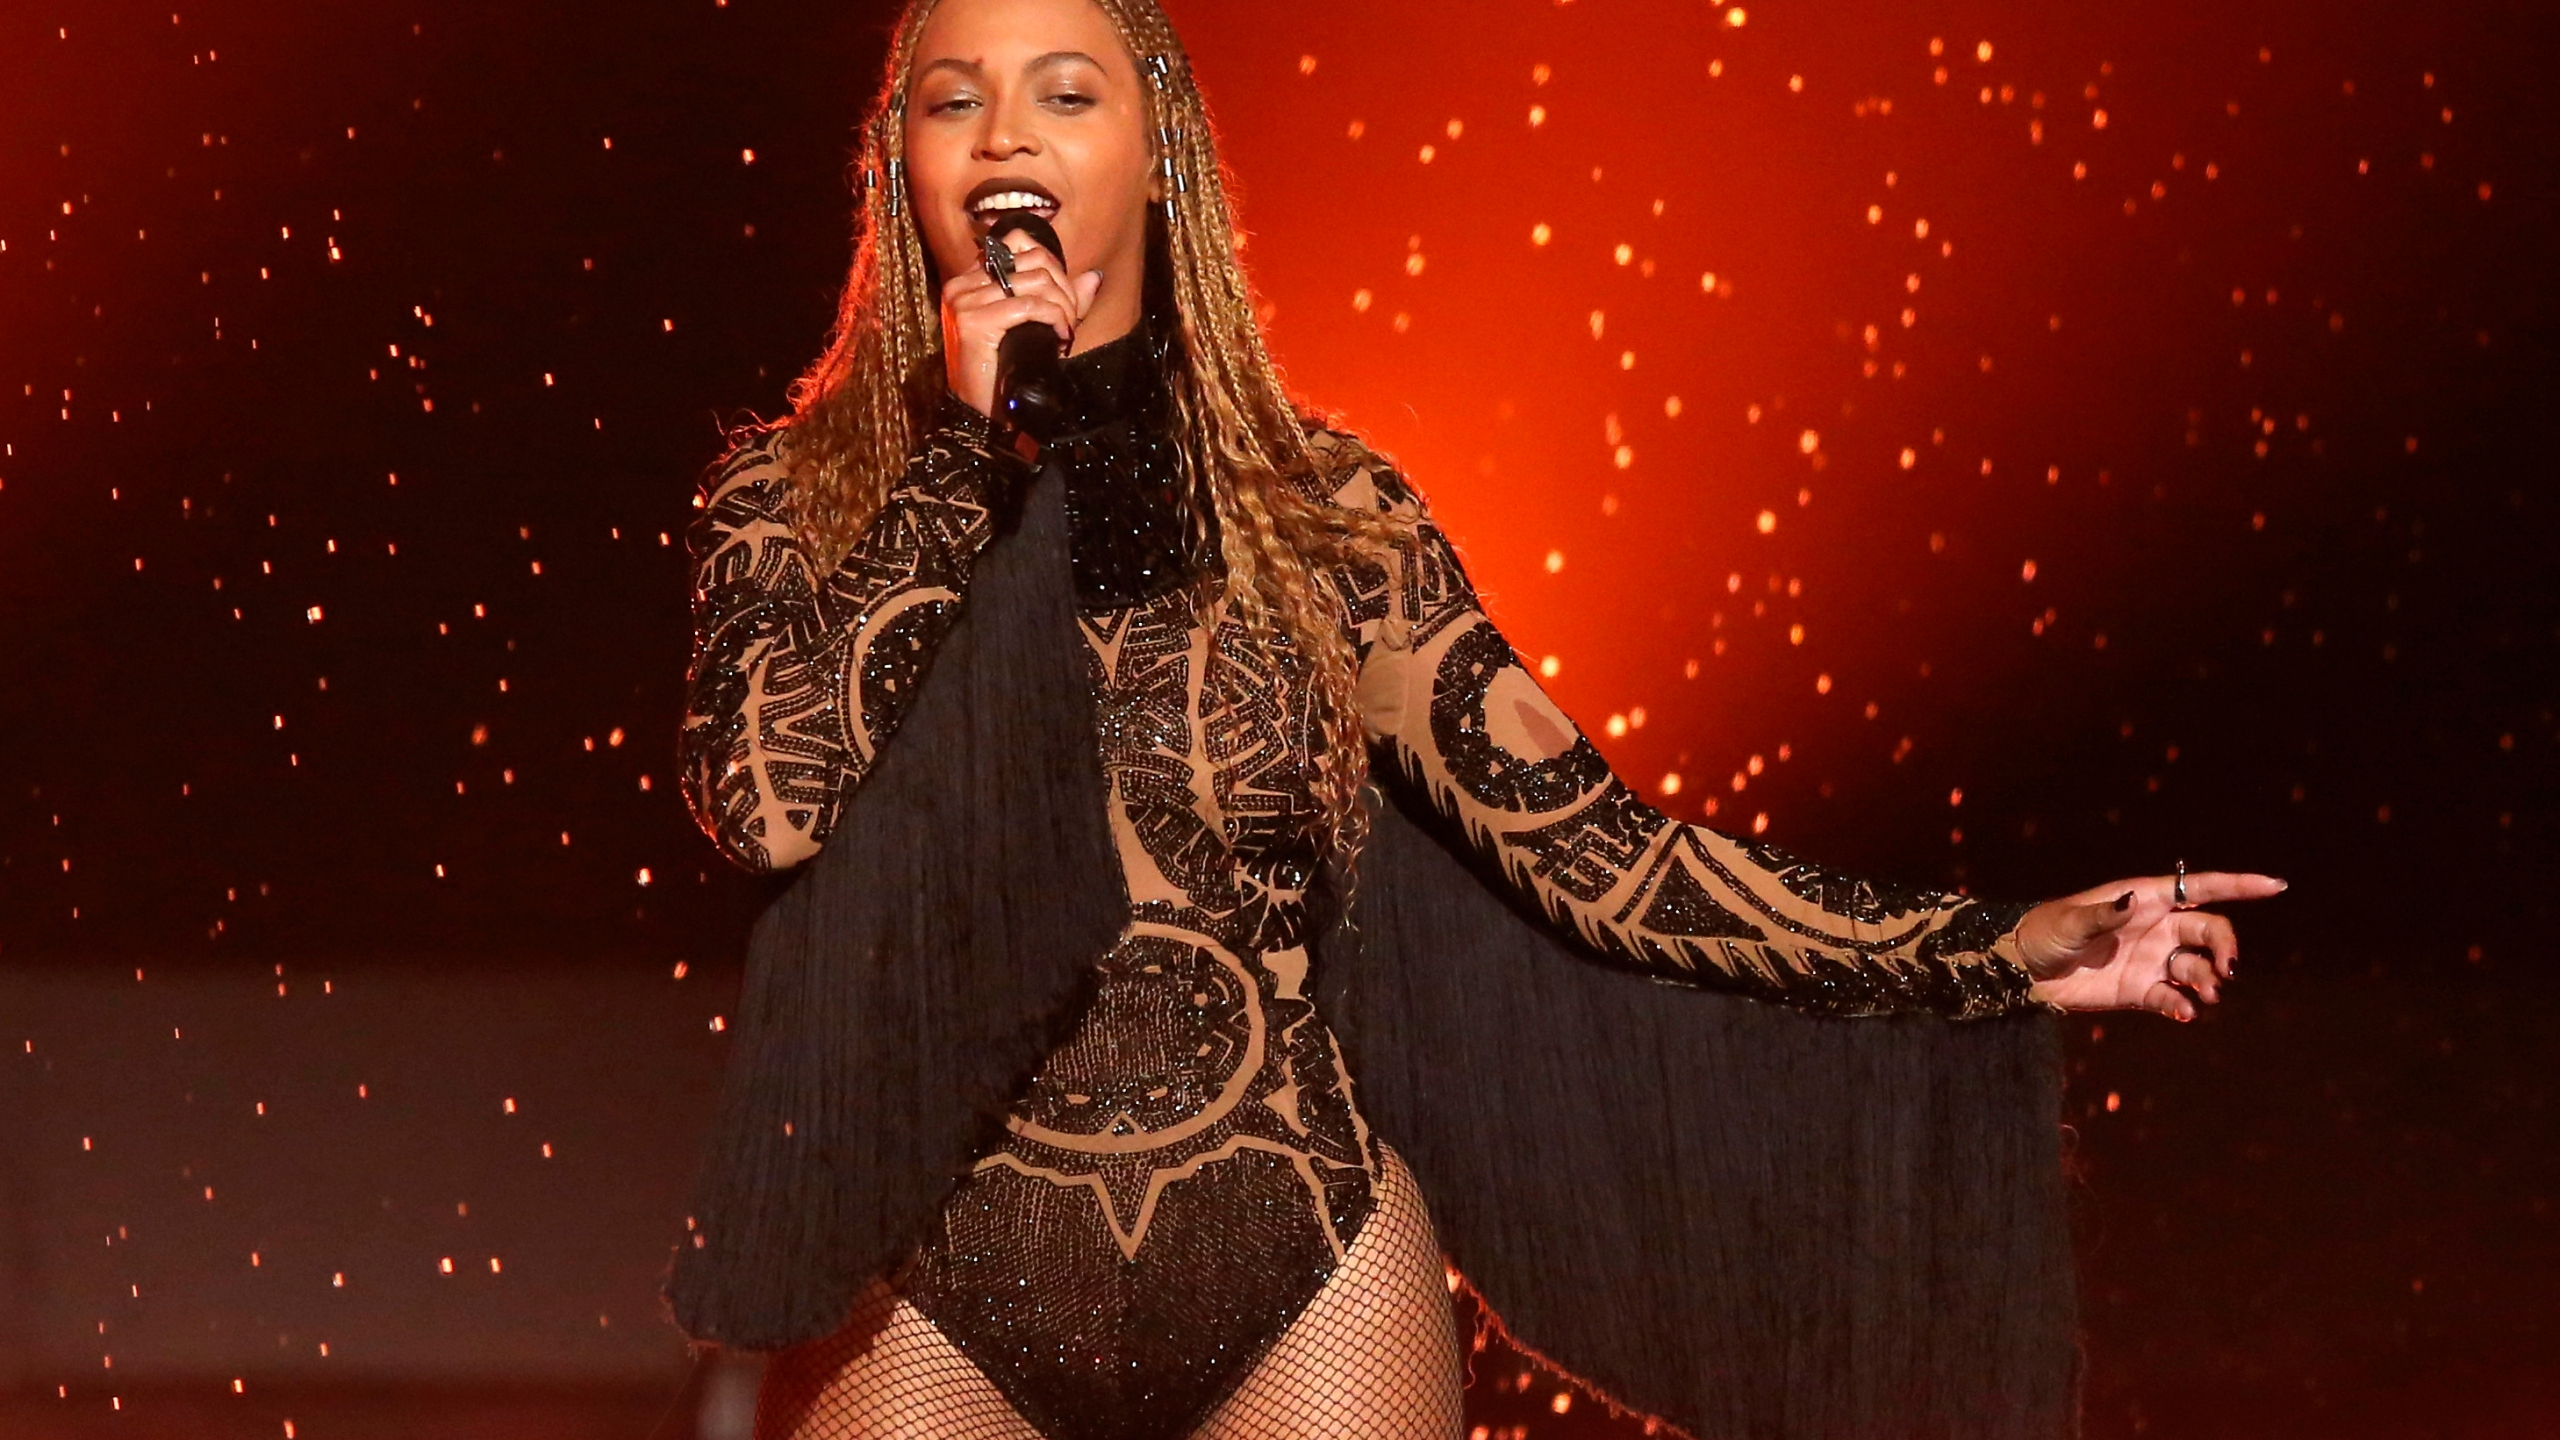 Beyonce-HBCUs_21731-159532.jpg13332968